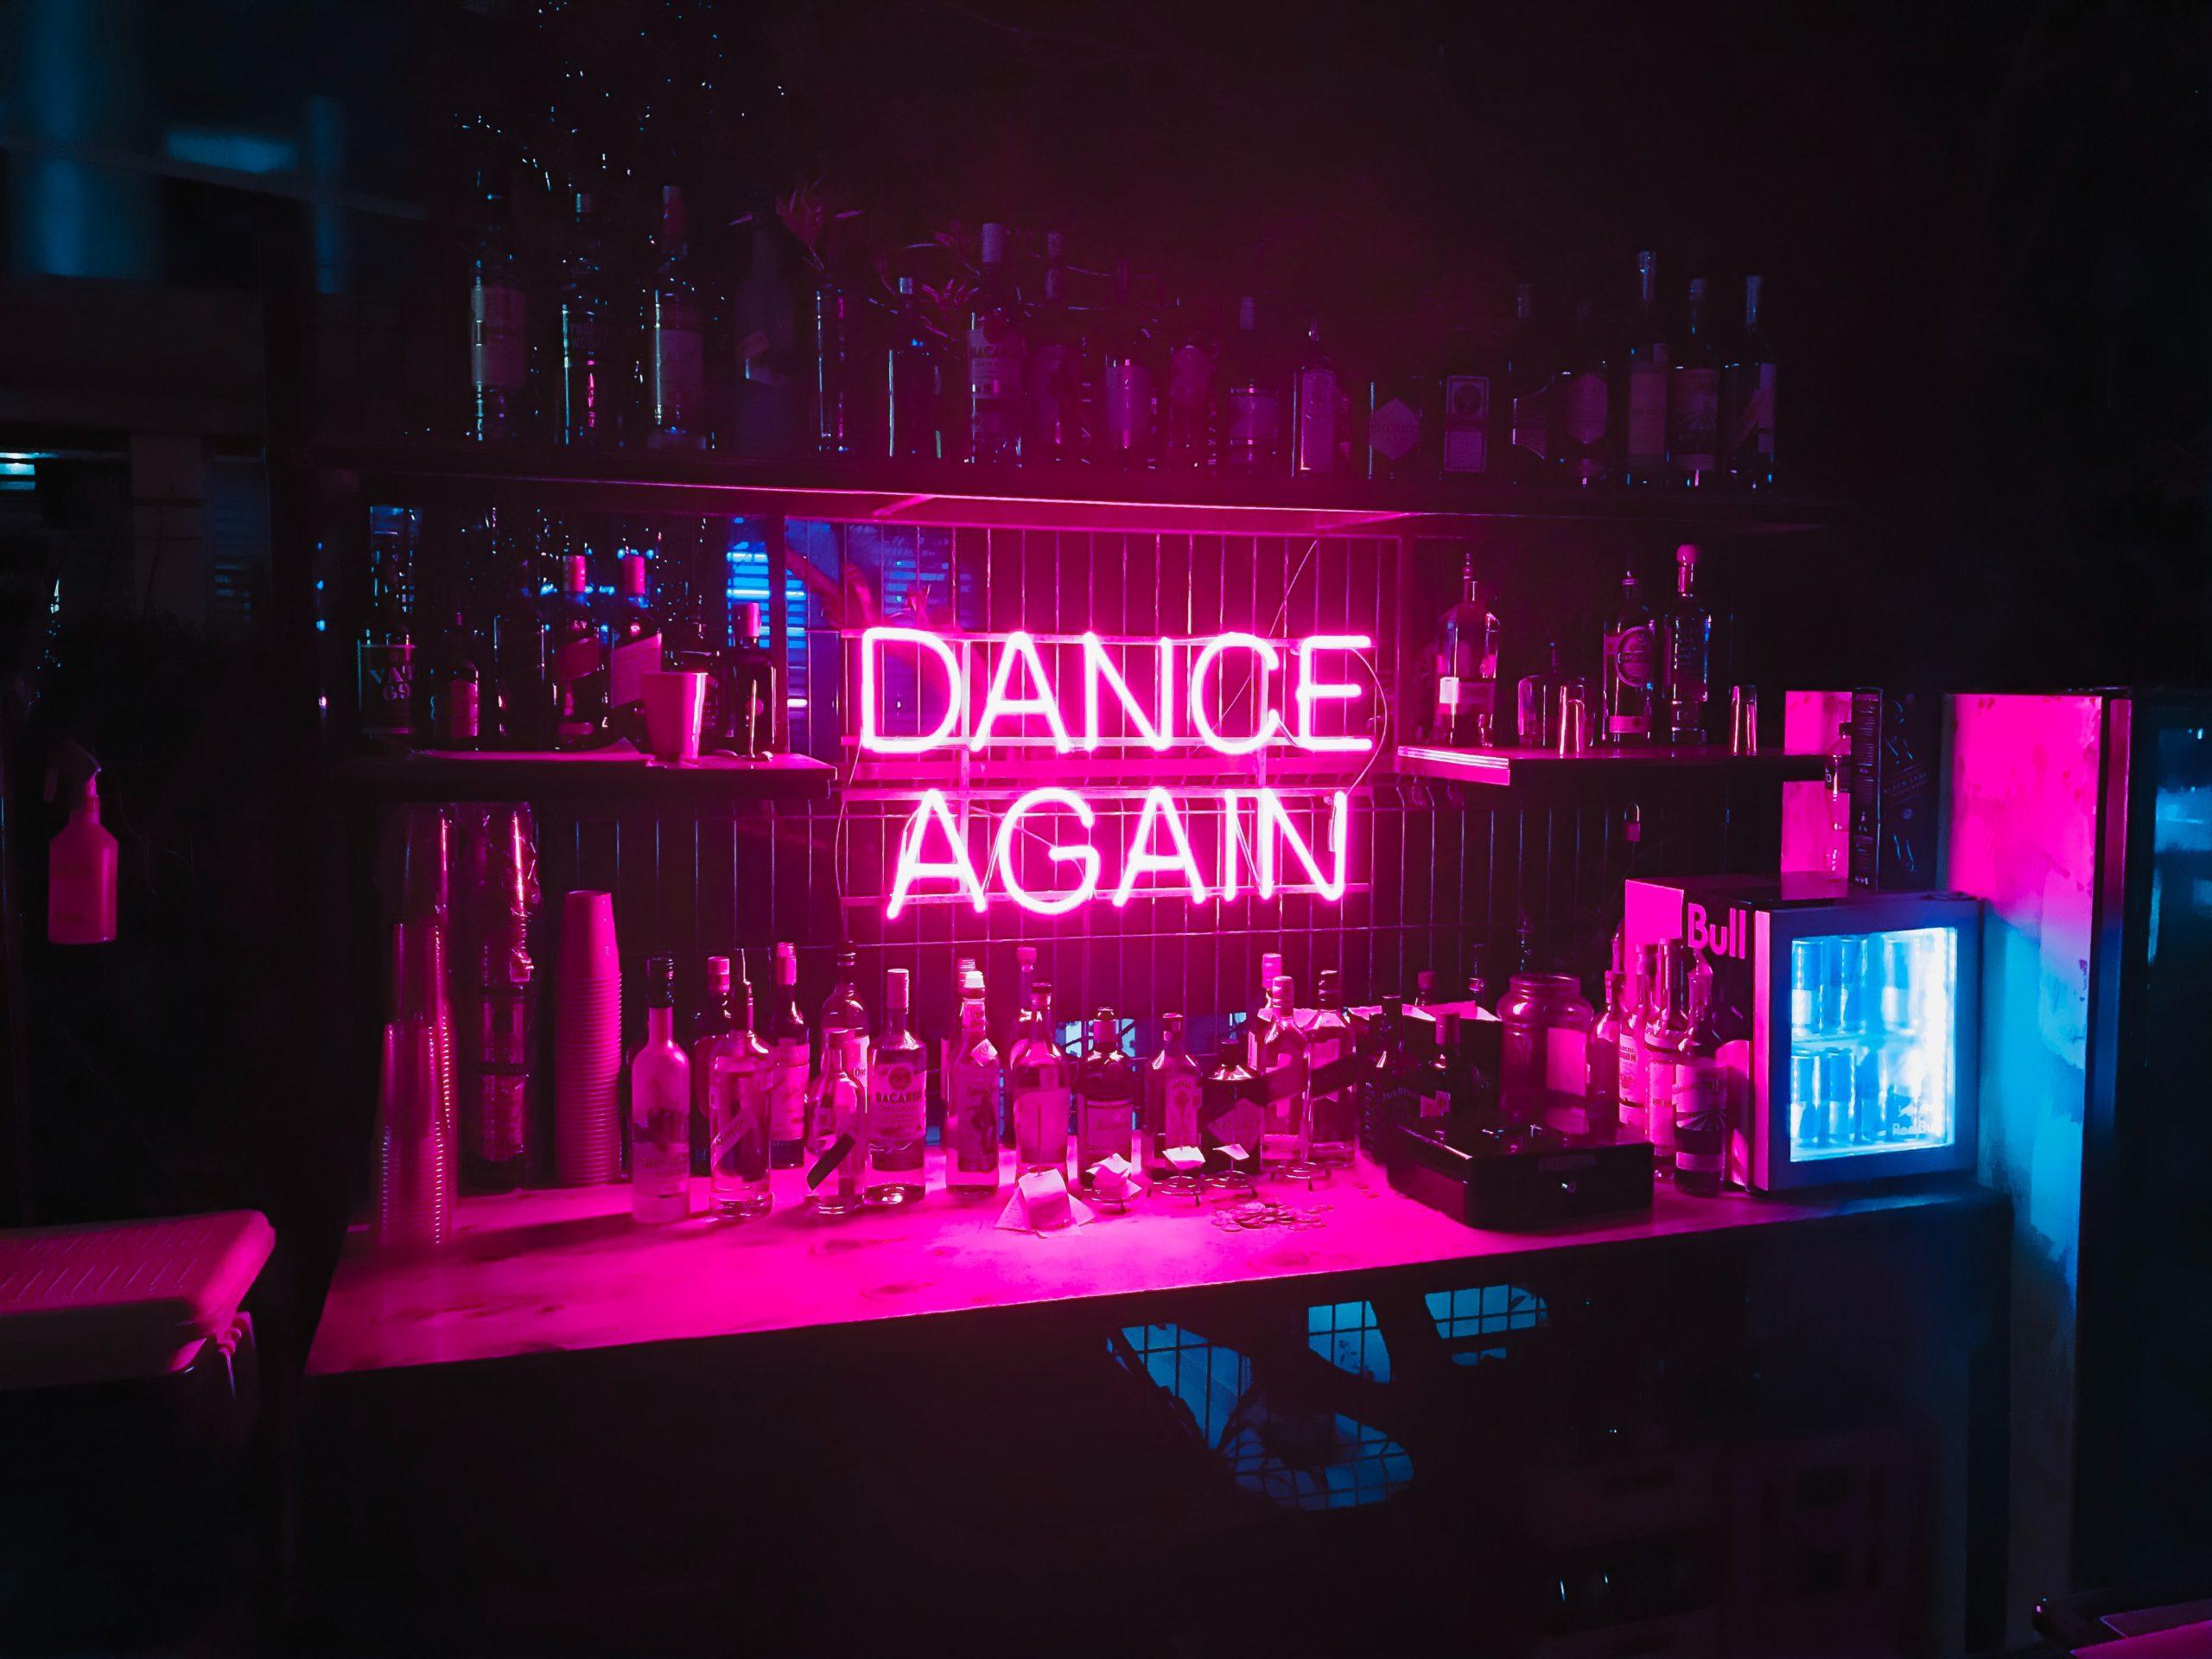 Dance again neon sign